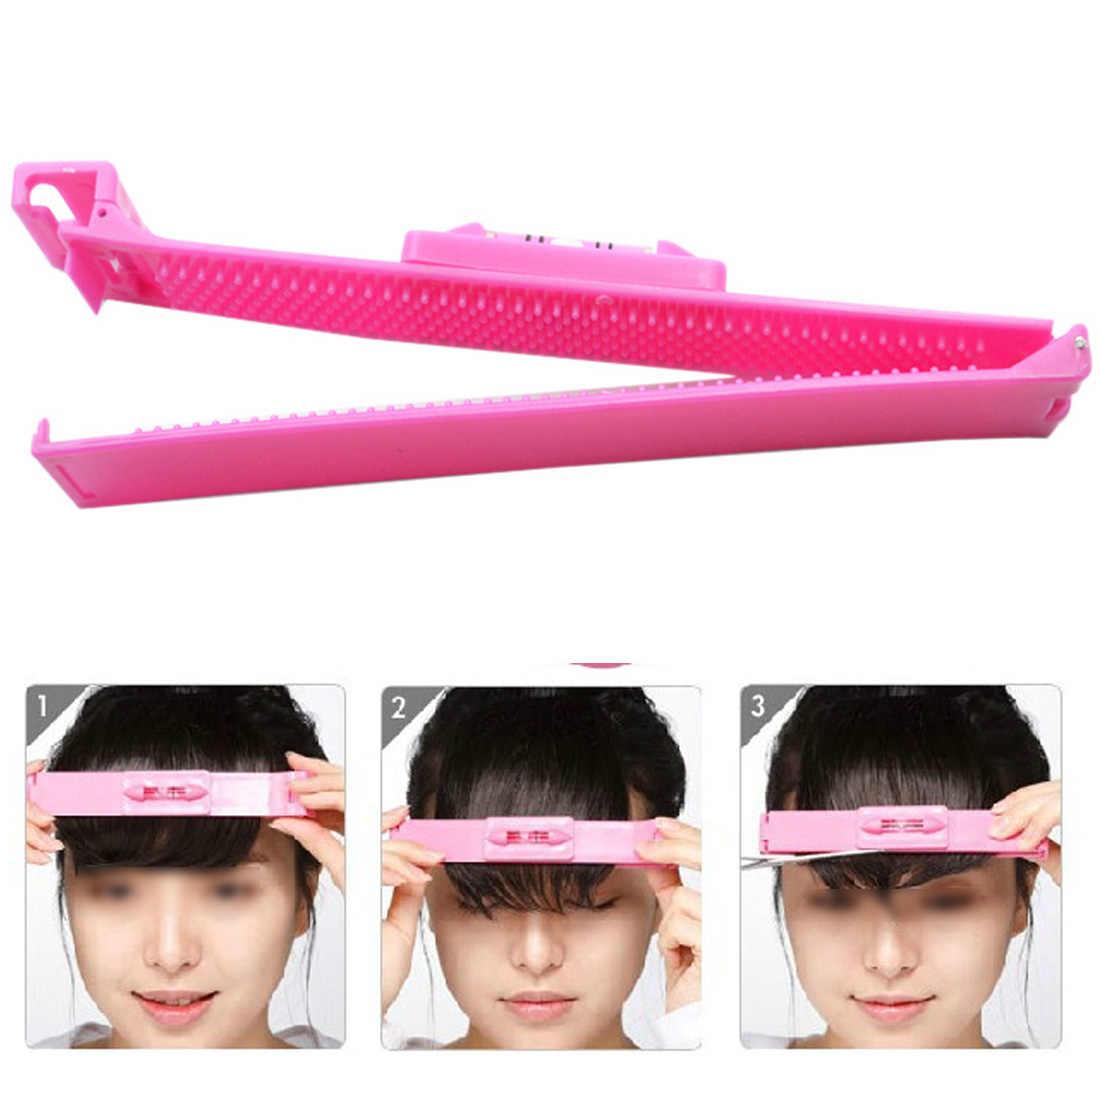 Forehead Hair Trimmer Fringe Cut Tool Hair Adjust Level